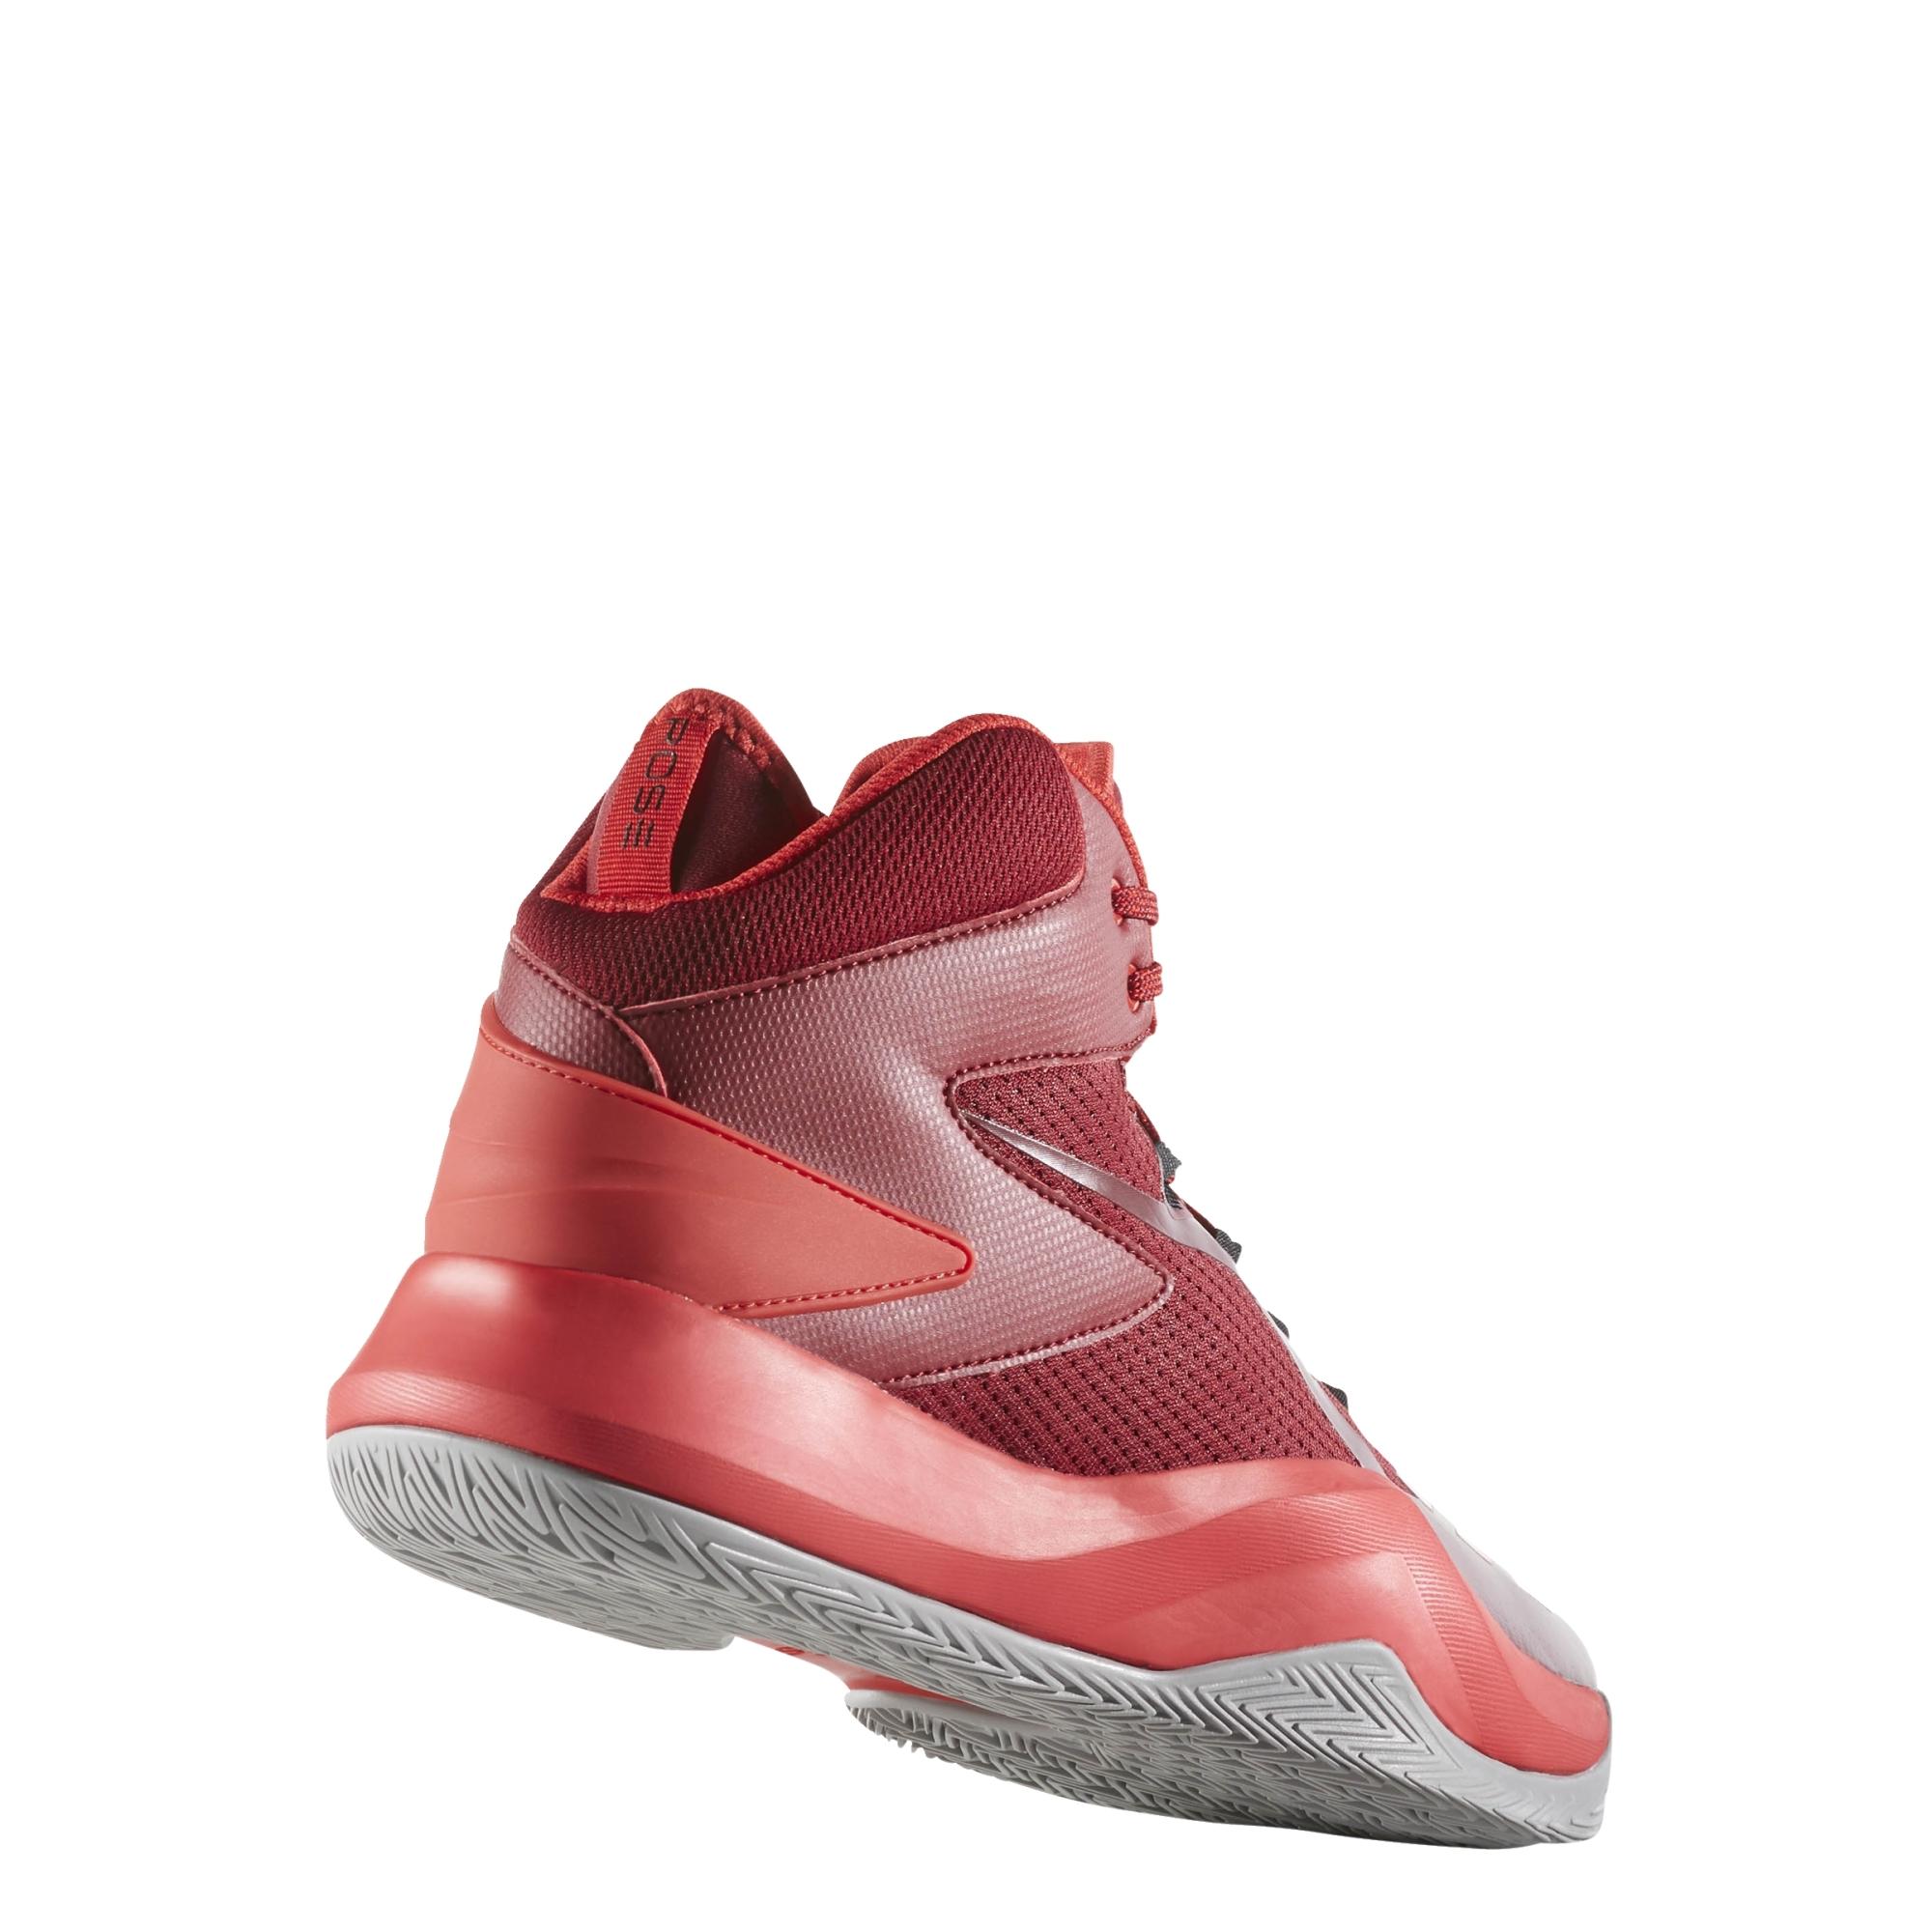 adidas D Rose Dominante IV BB8179